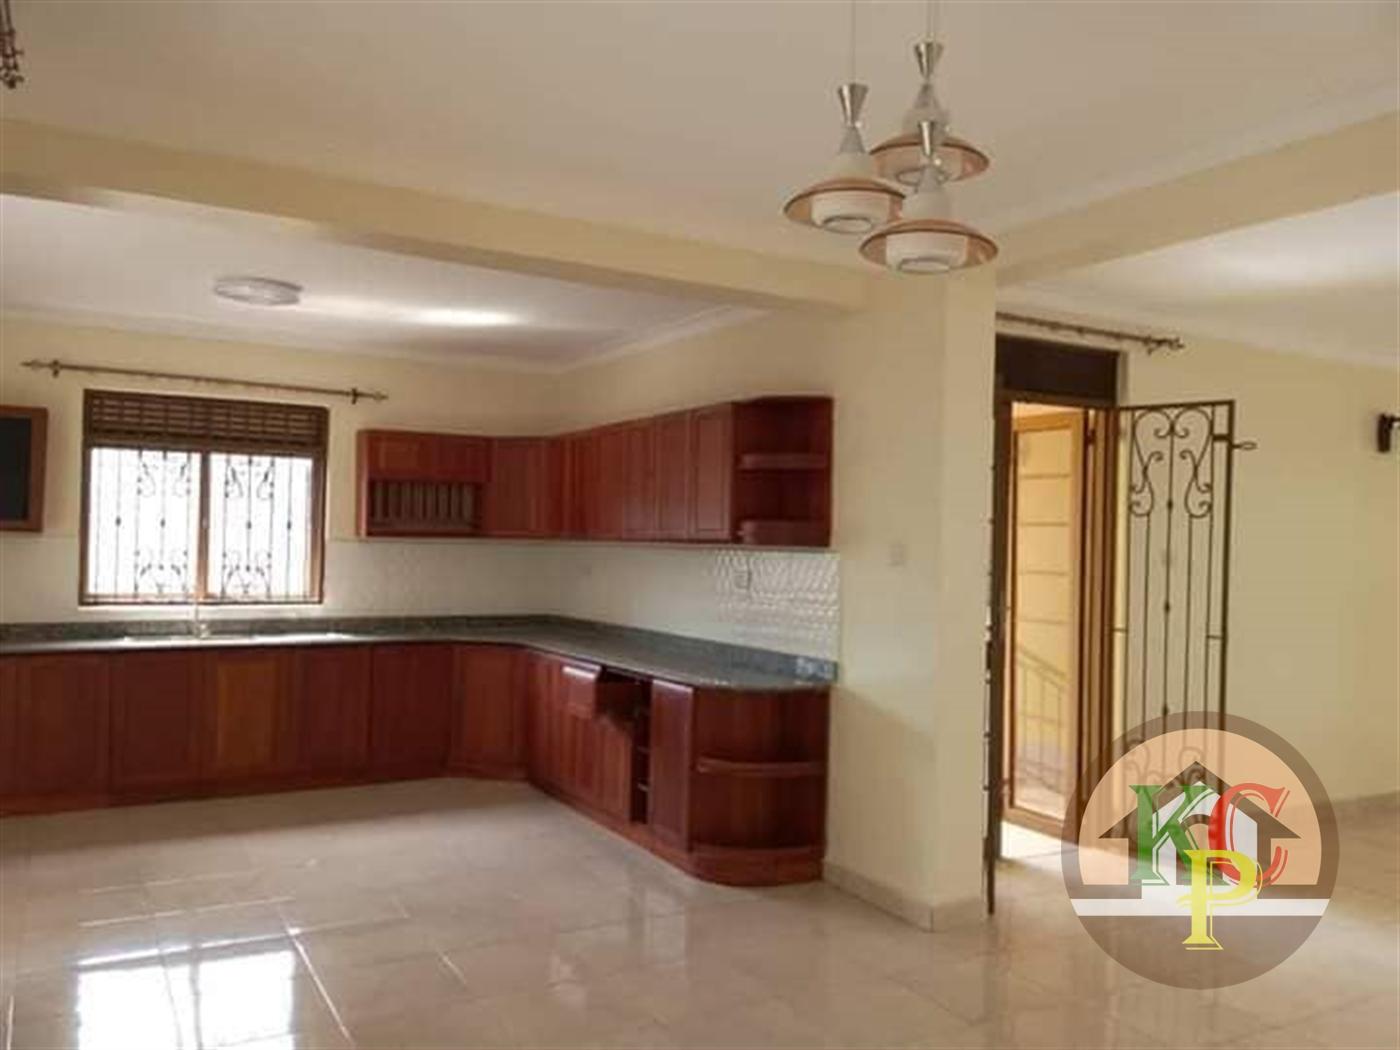 Apartment for rent in Kiira Wakiso